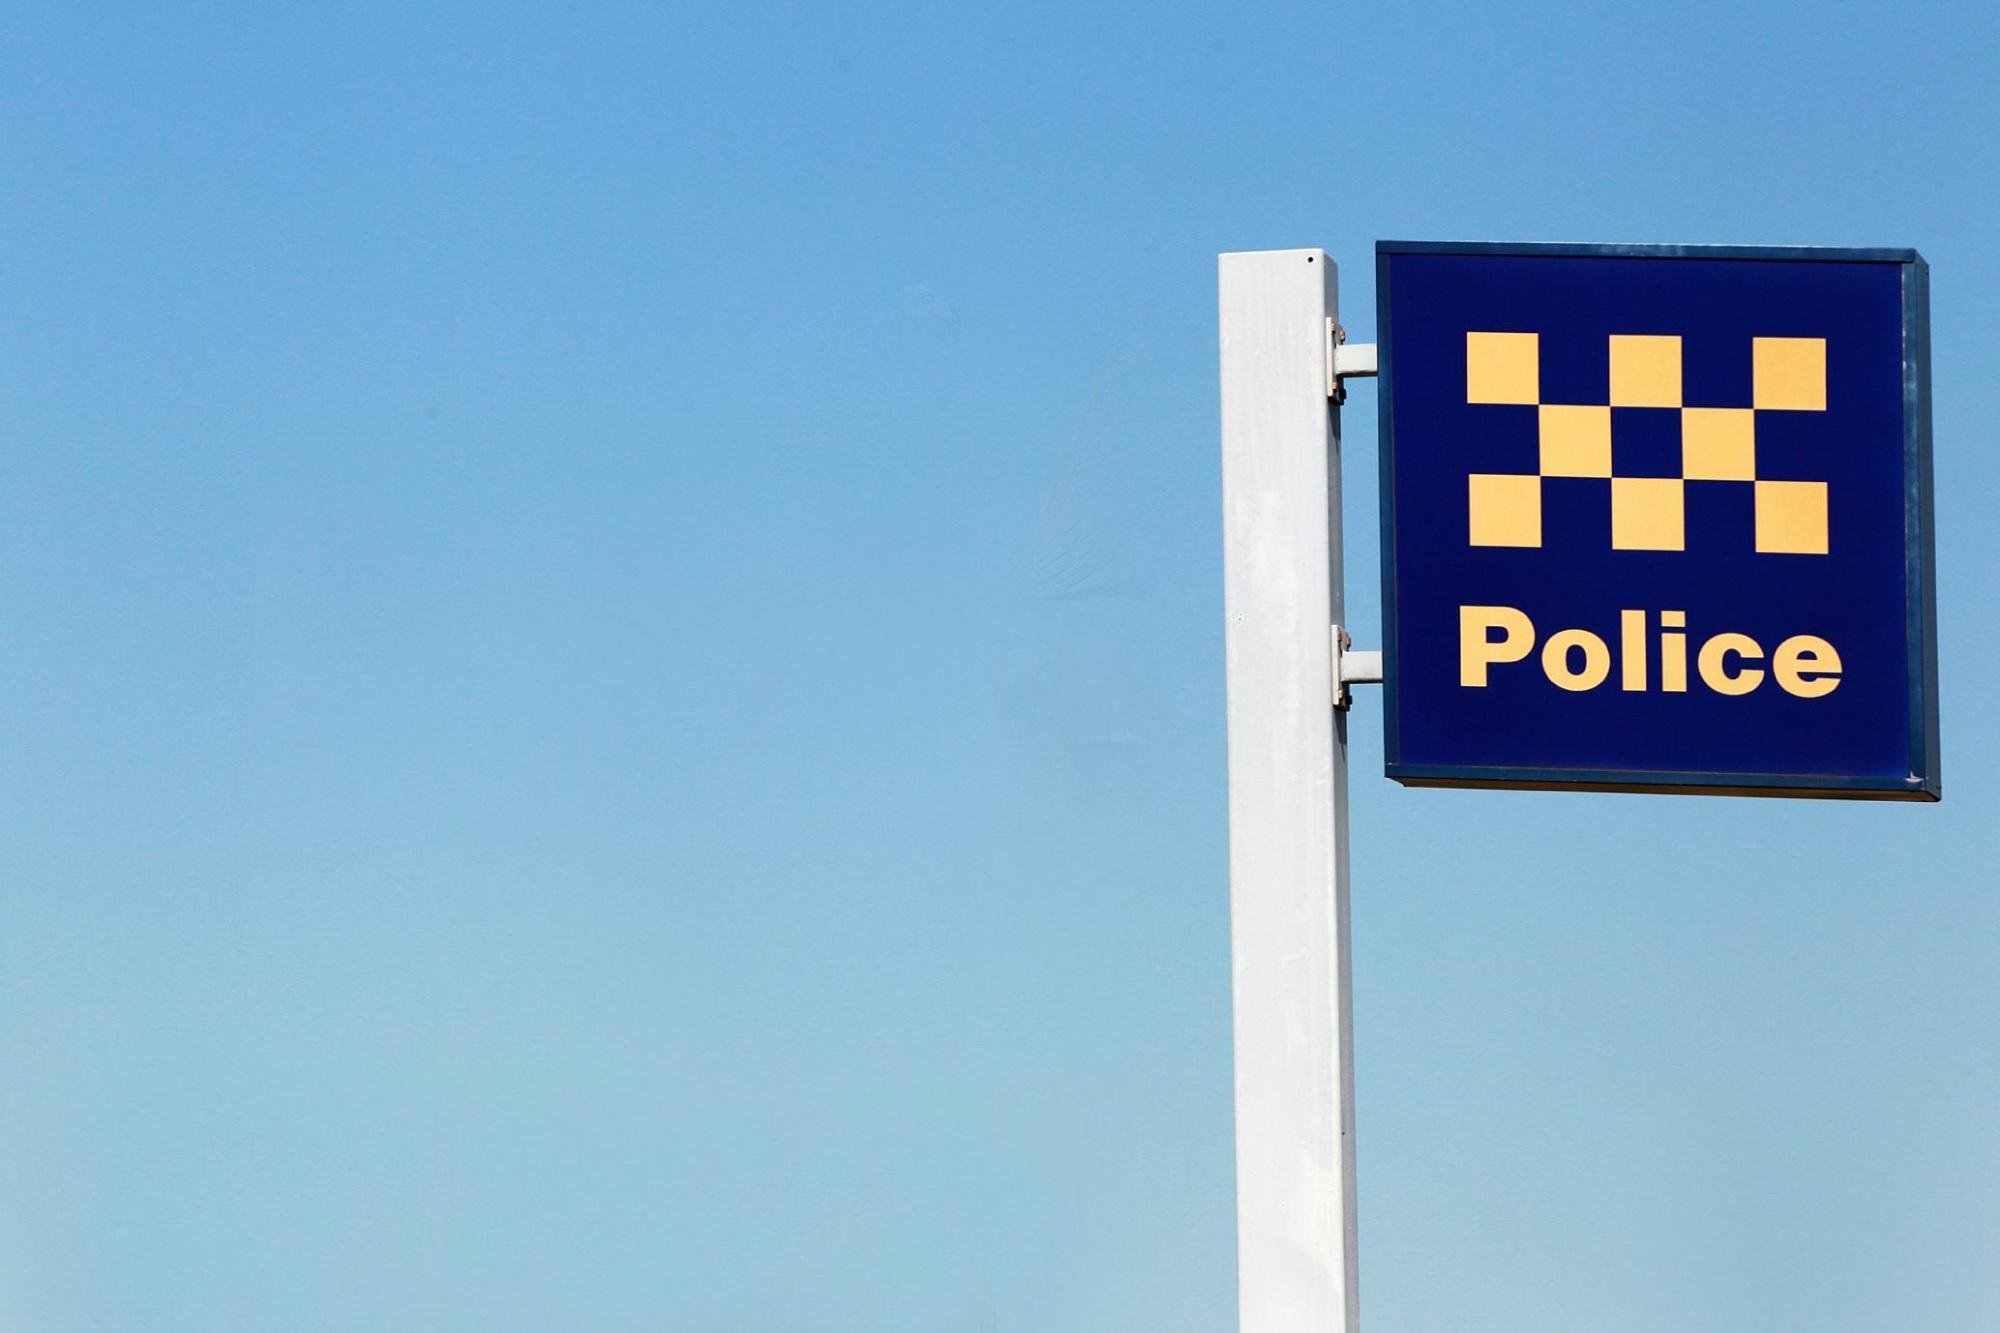 Bentley armed robberies: police release image of suspect